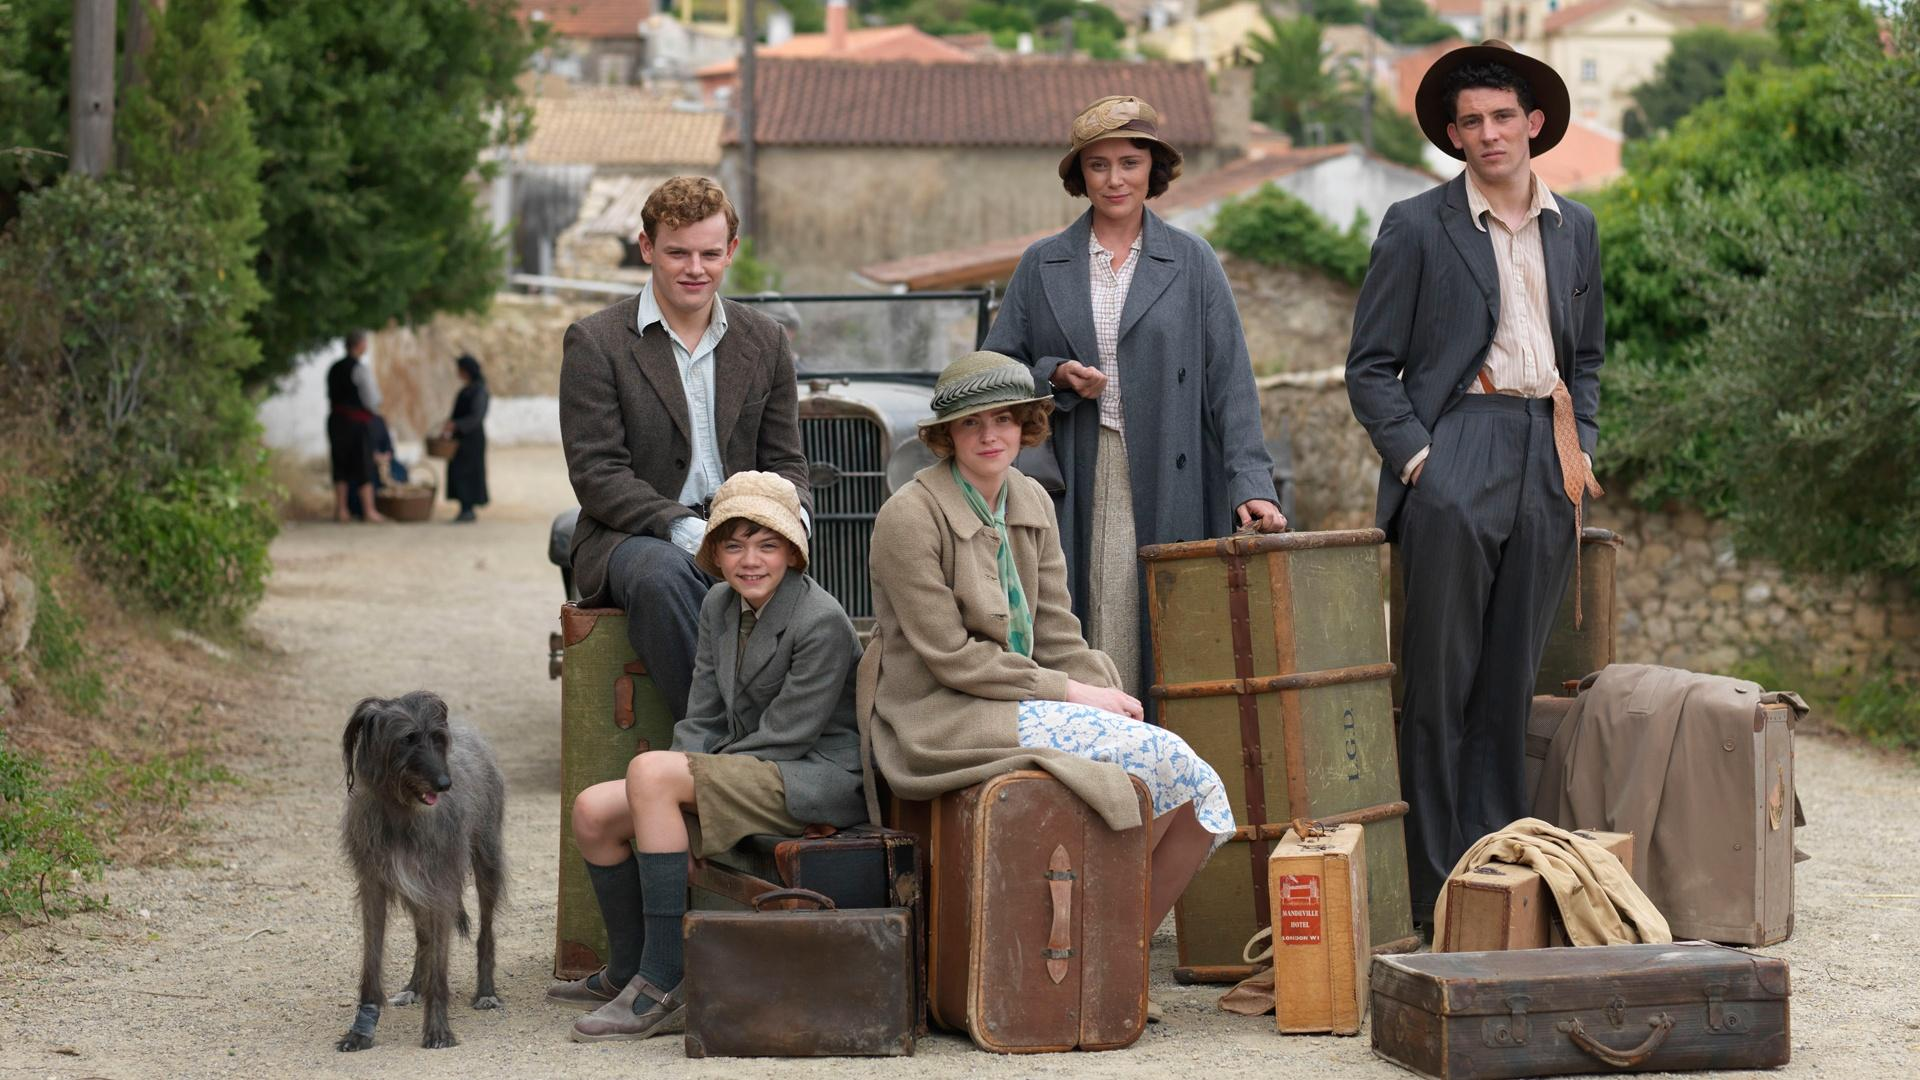 The Durrells in Corfu: Episode 1